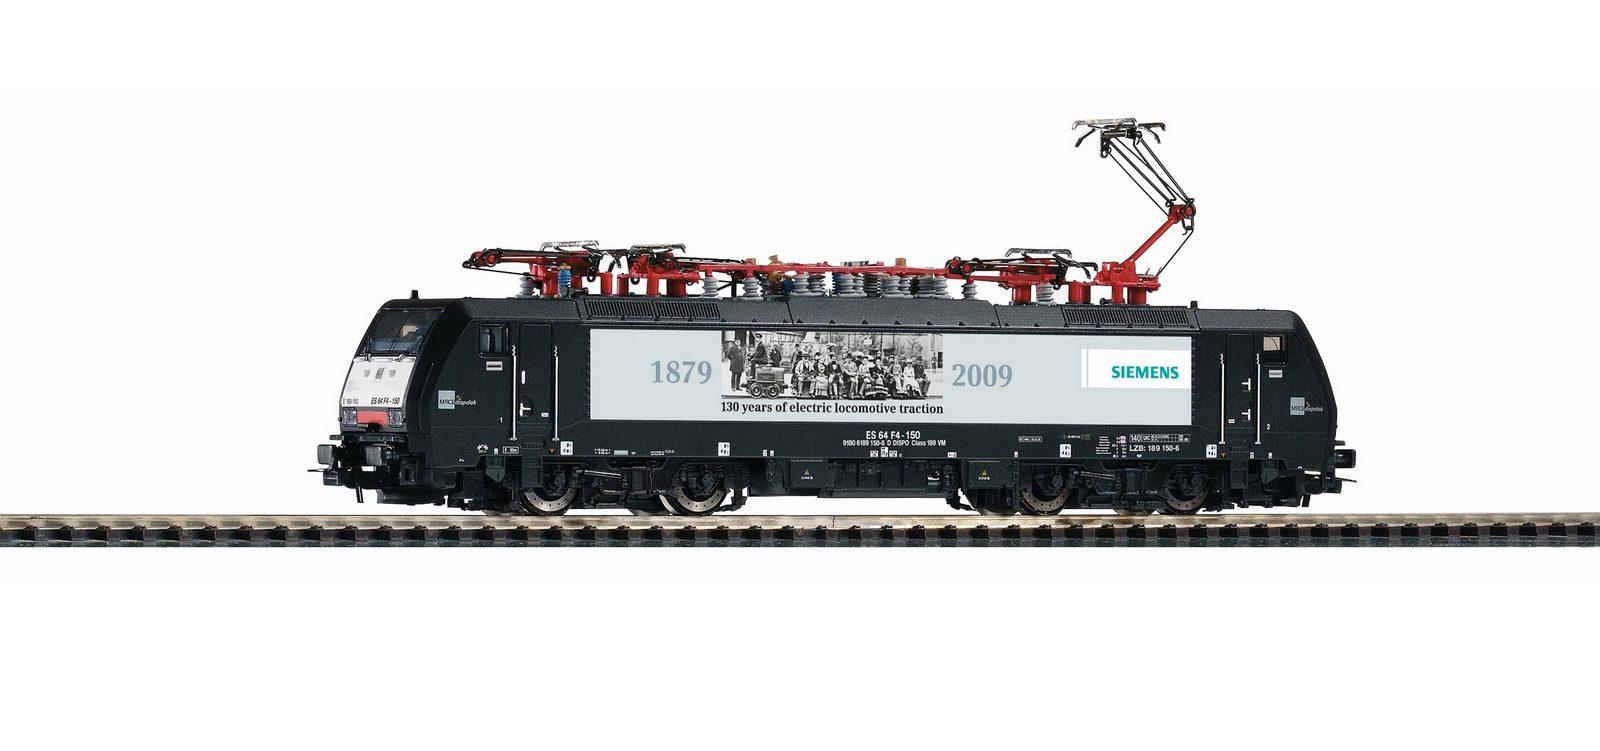 PIKO Elektrolokomotive, »E-Lok BR 189 Siemens - Gleichstrom« Spur H0 - broschei